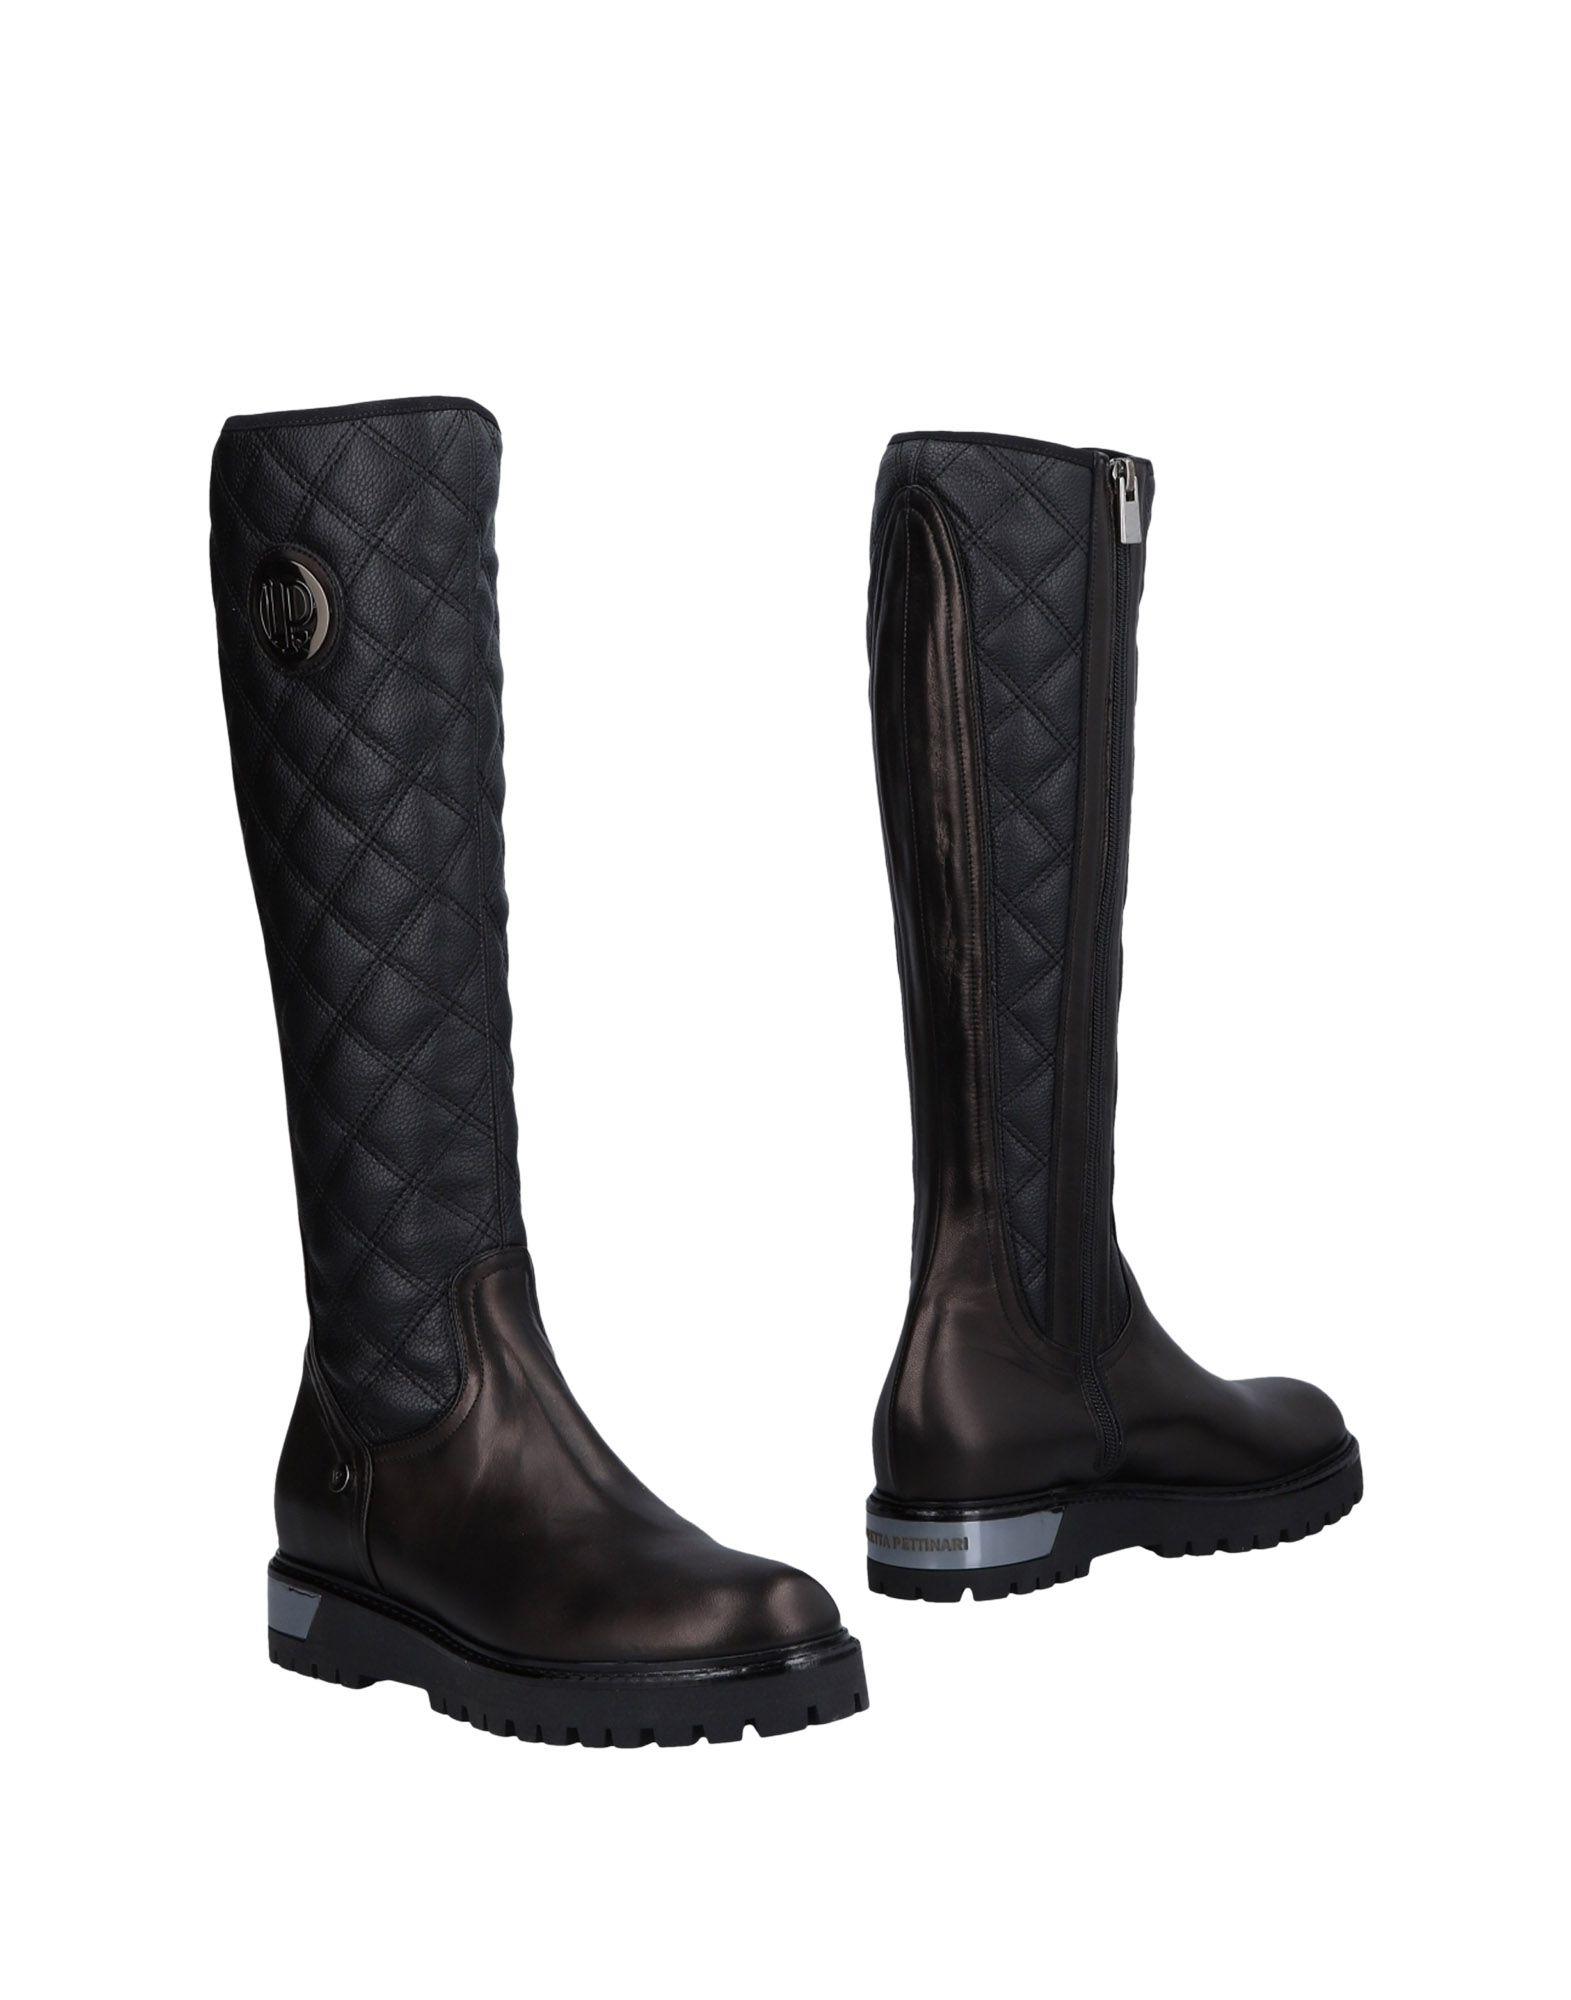 Loretta Pettinari 11471862RV Stiefel Damen  11471862RV Pettinari Beliebte Schuhe 2d298b